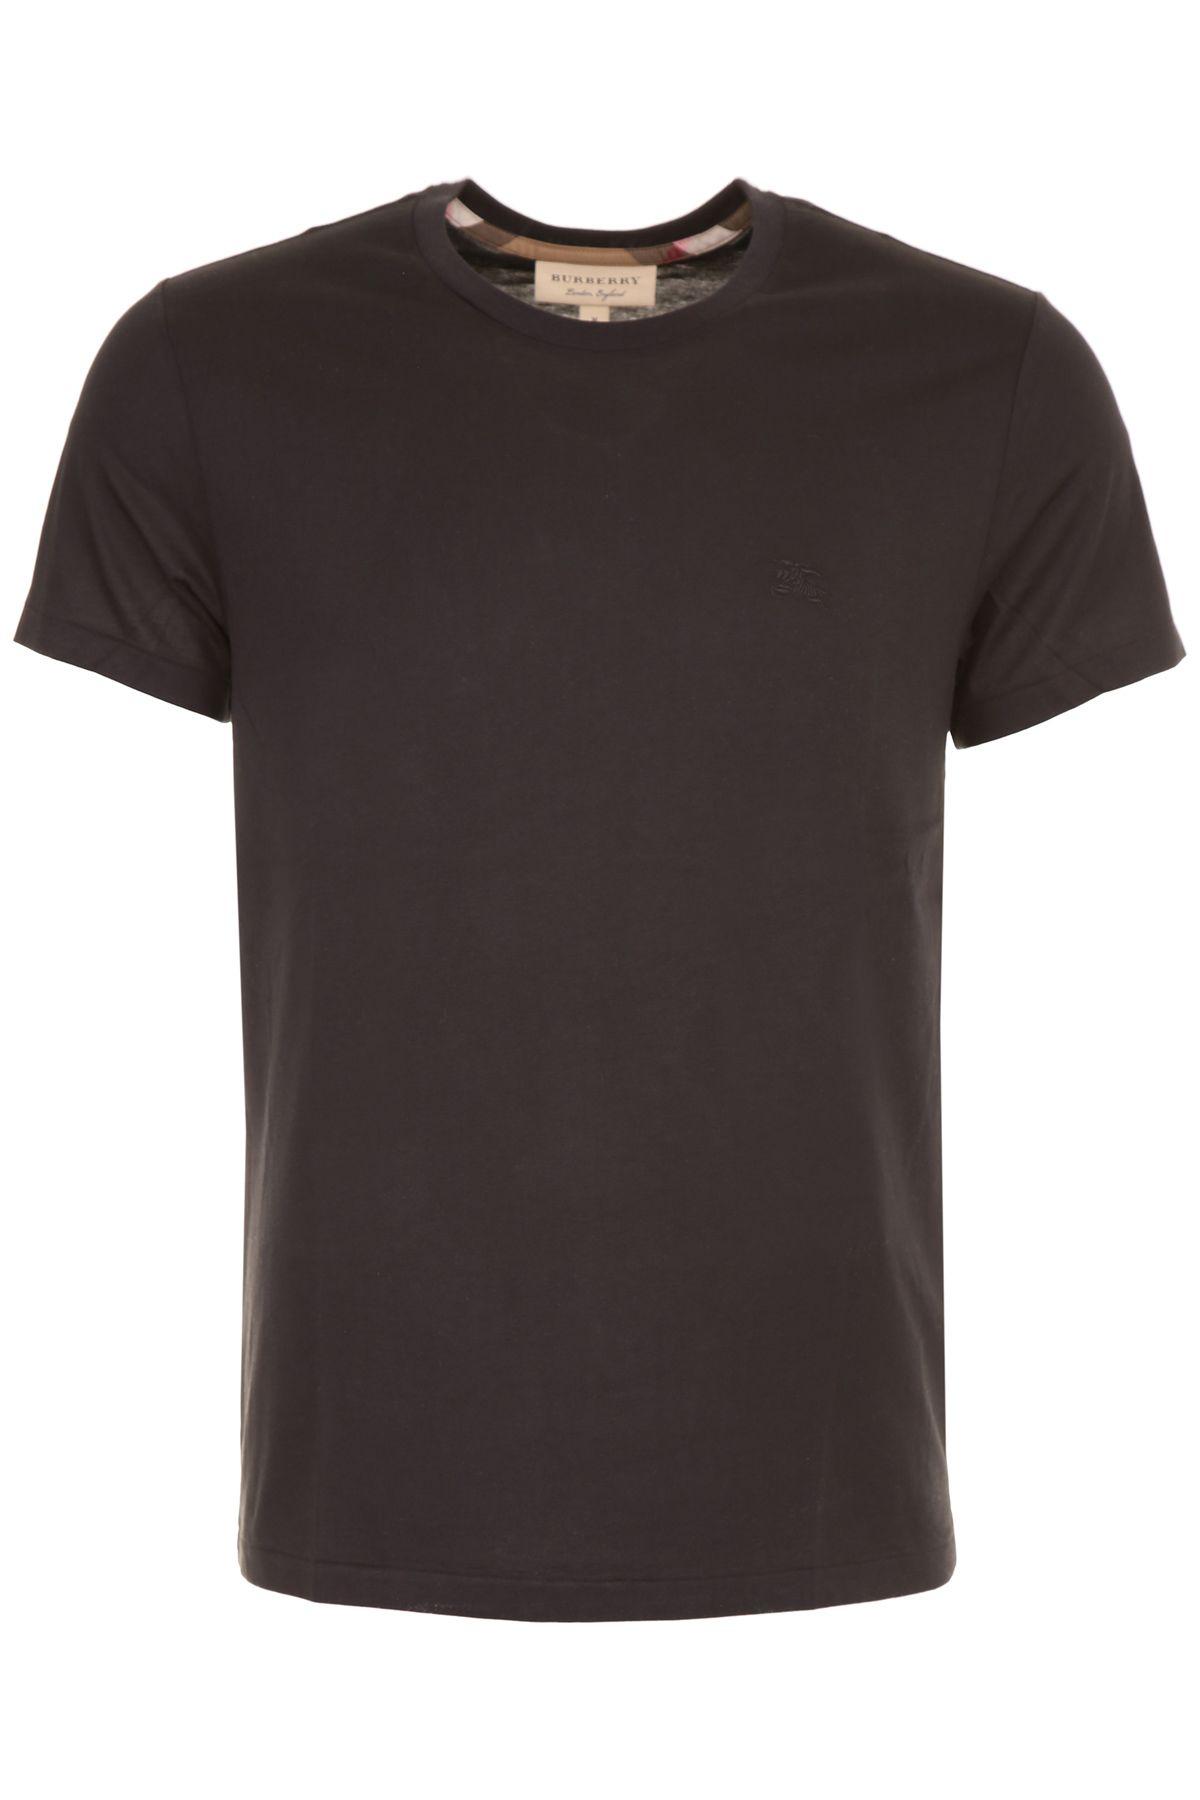 Joeforth T-shirt